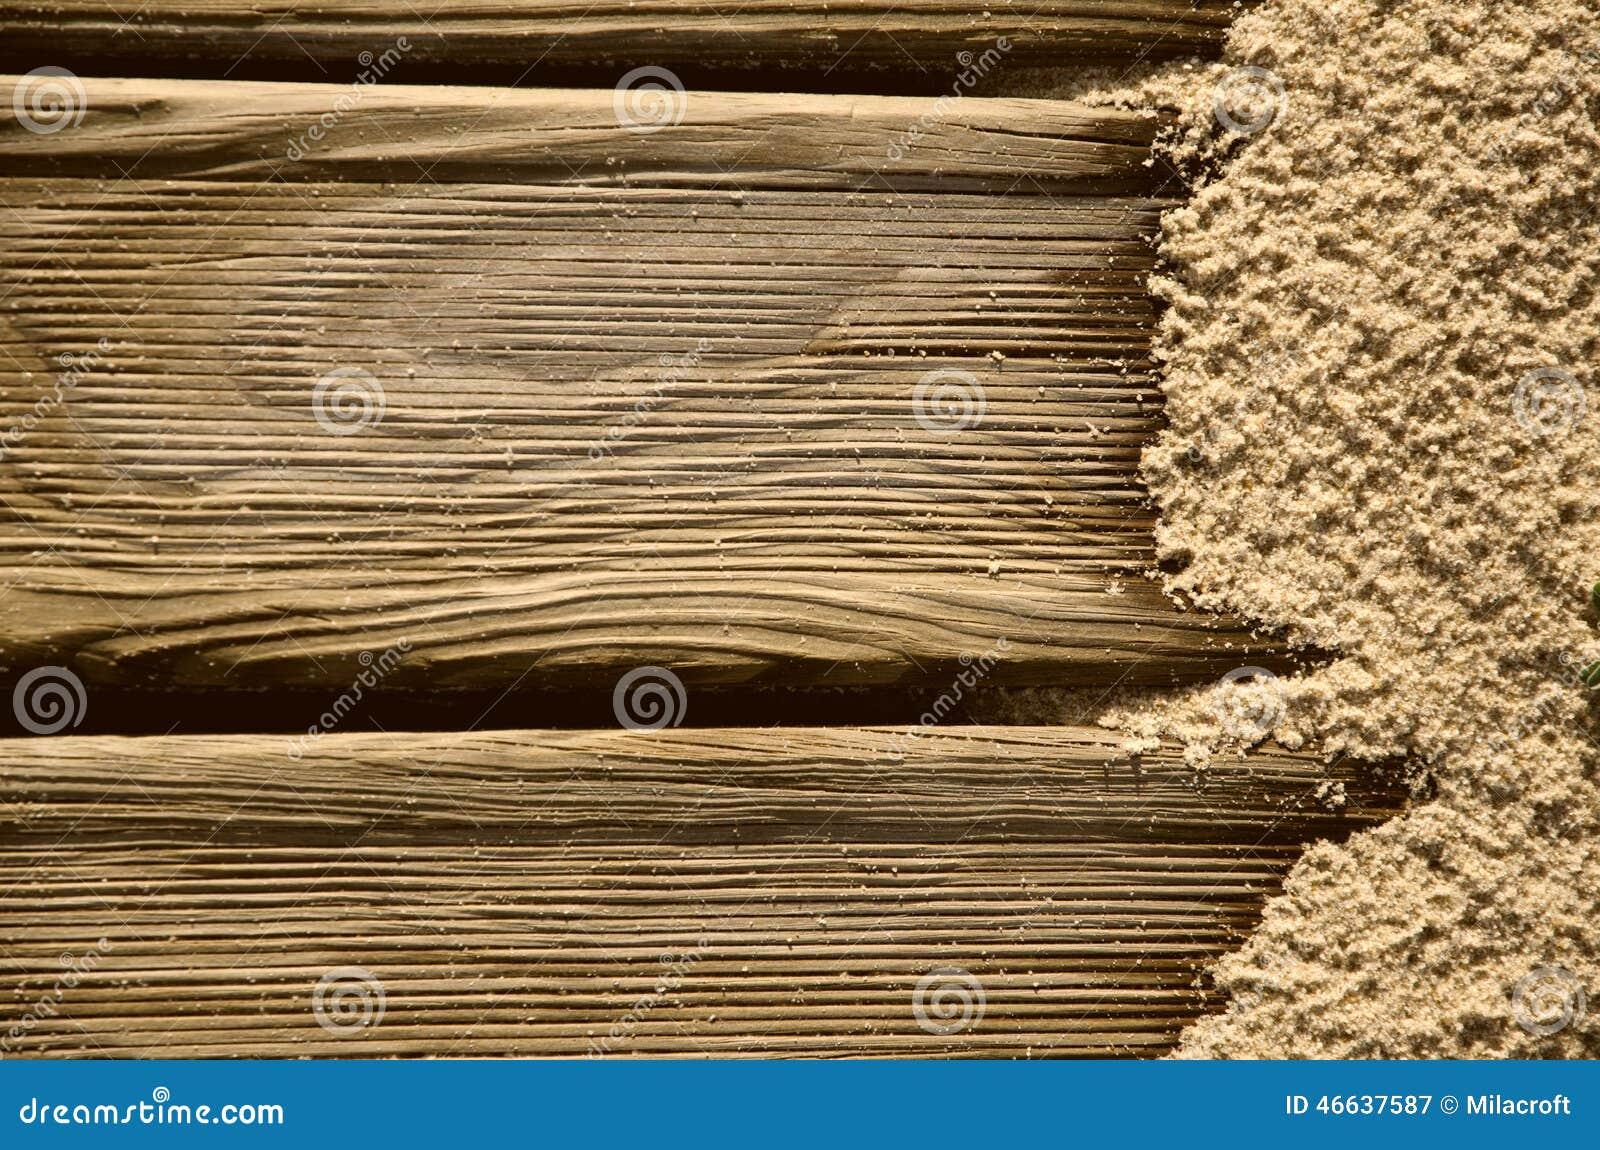 fond avec du bois et le sable image stock image 46637587. Black Bedroom Furniture Sets. Home Design Ideas